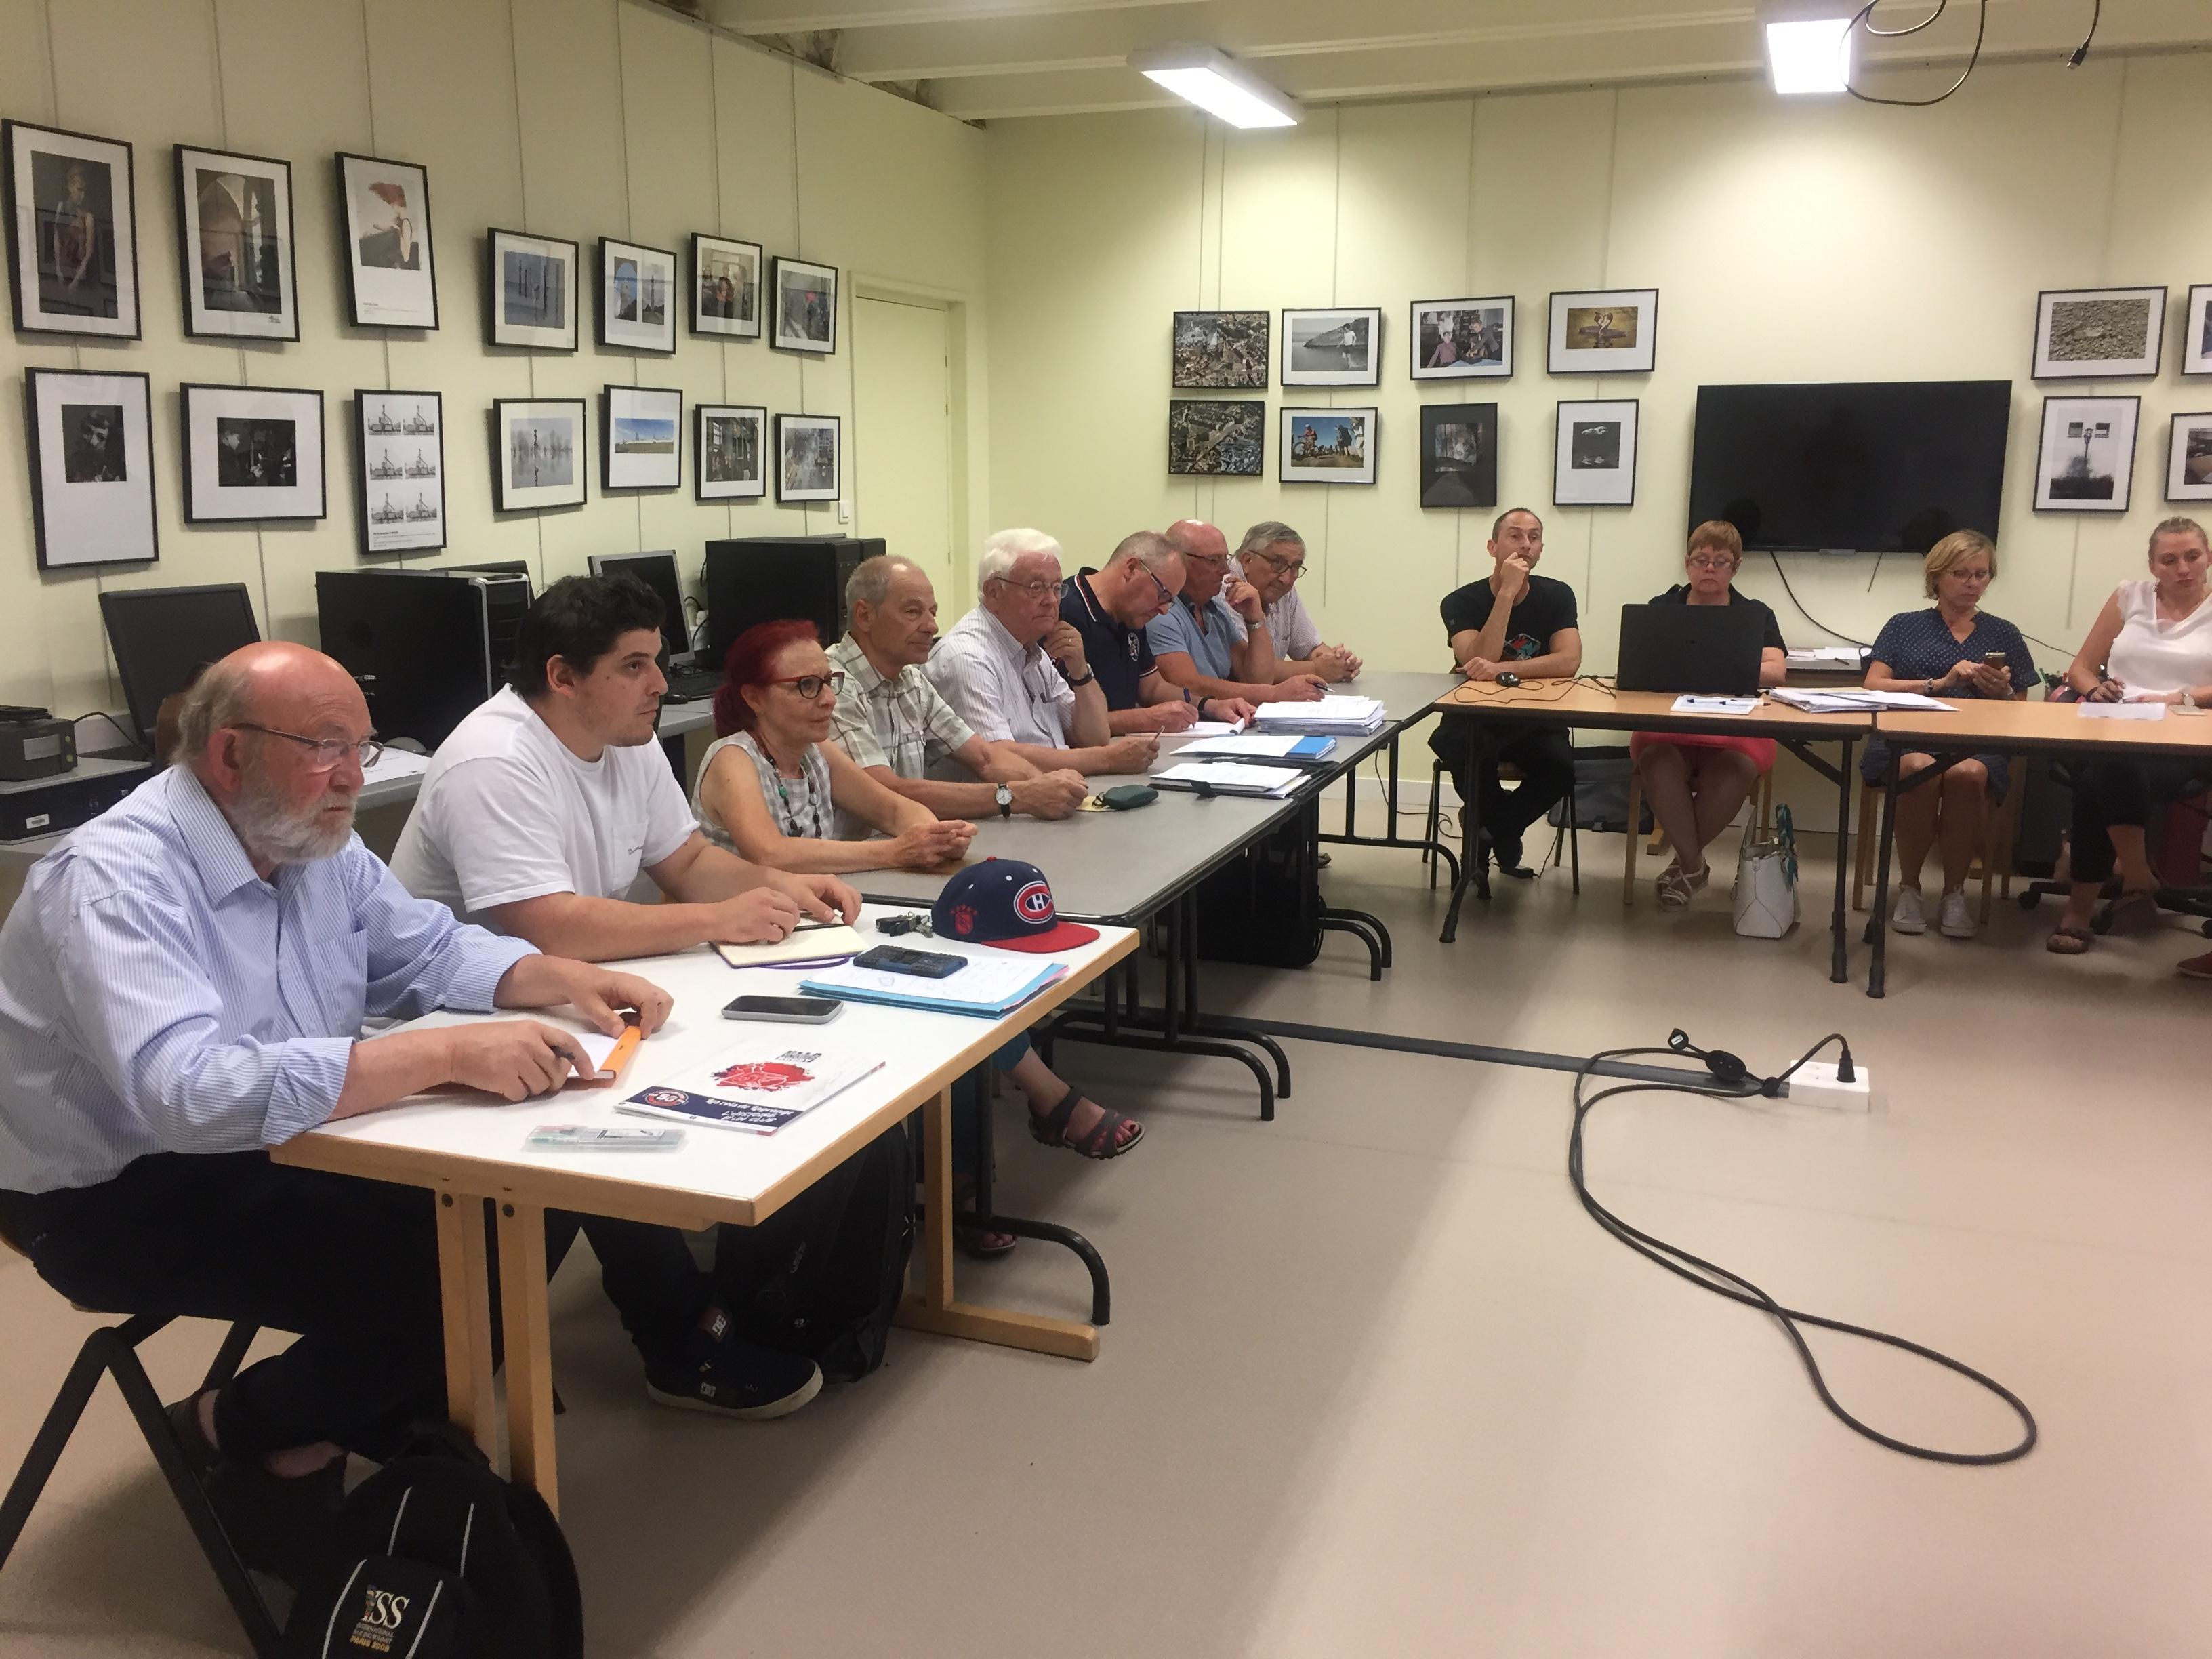 Le Conseil d'Administration du CLLA siège au Photo Club